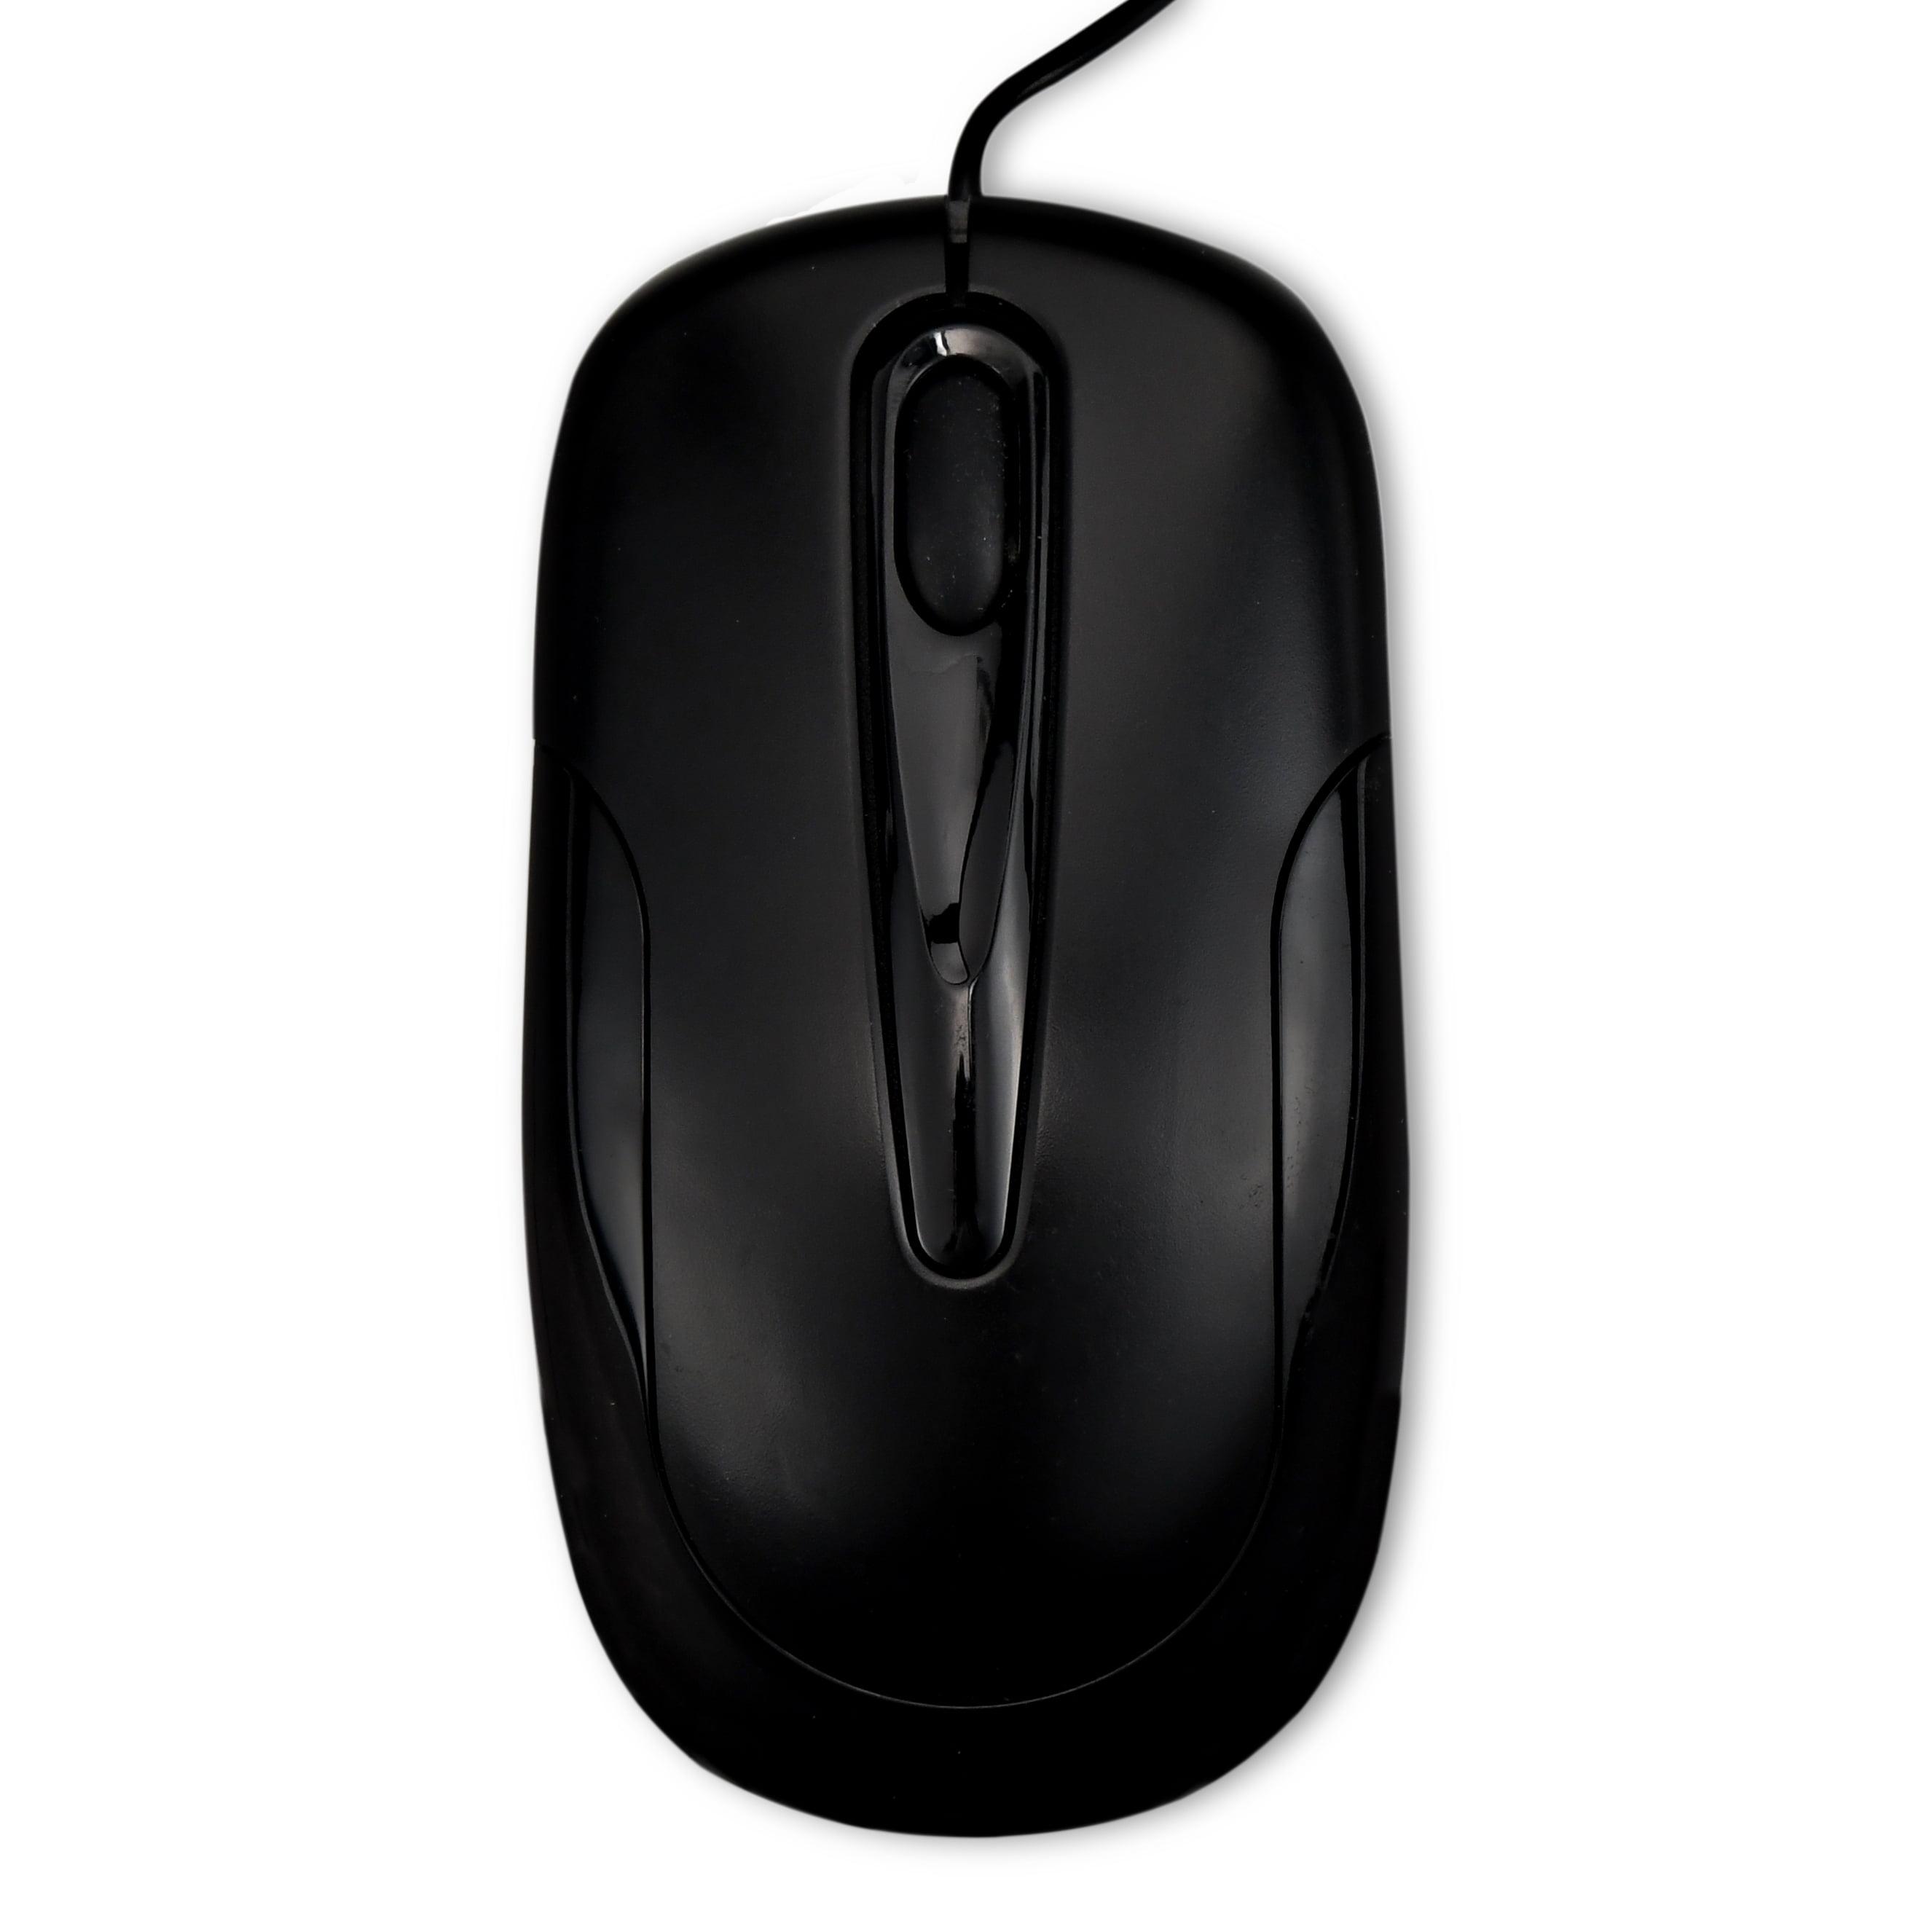 fc6e5984aed Onn Standard 3D Optical Mouse With Scroll Wheel, Black - Walmart.com